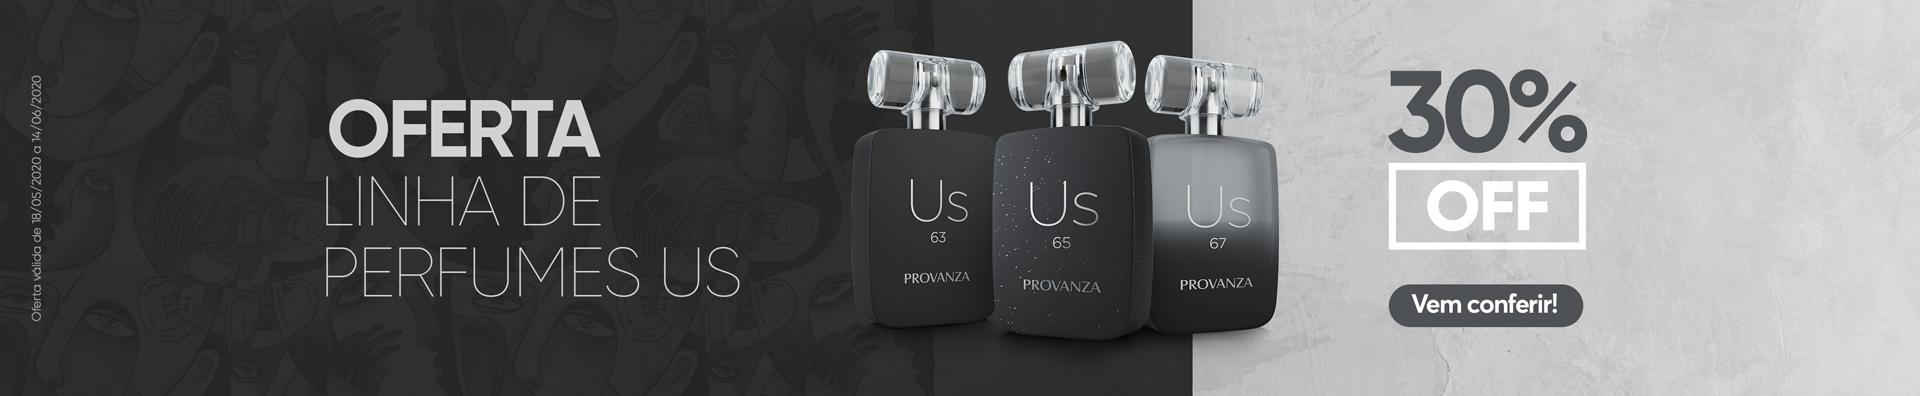 Banner - Oferta Perfumes